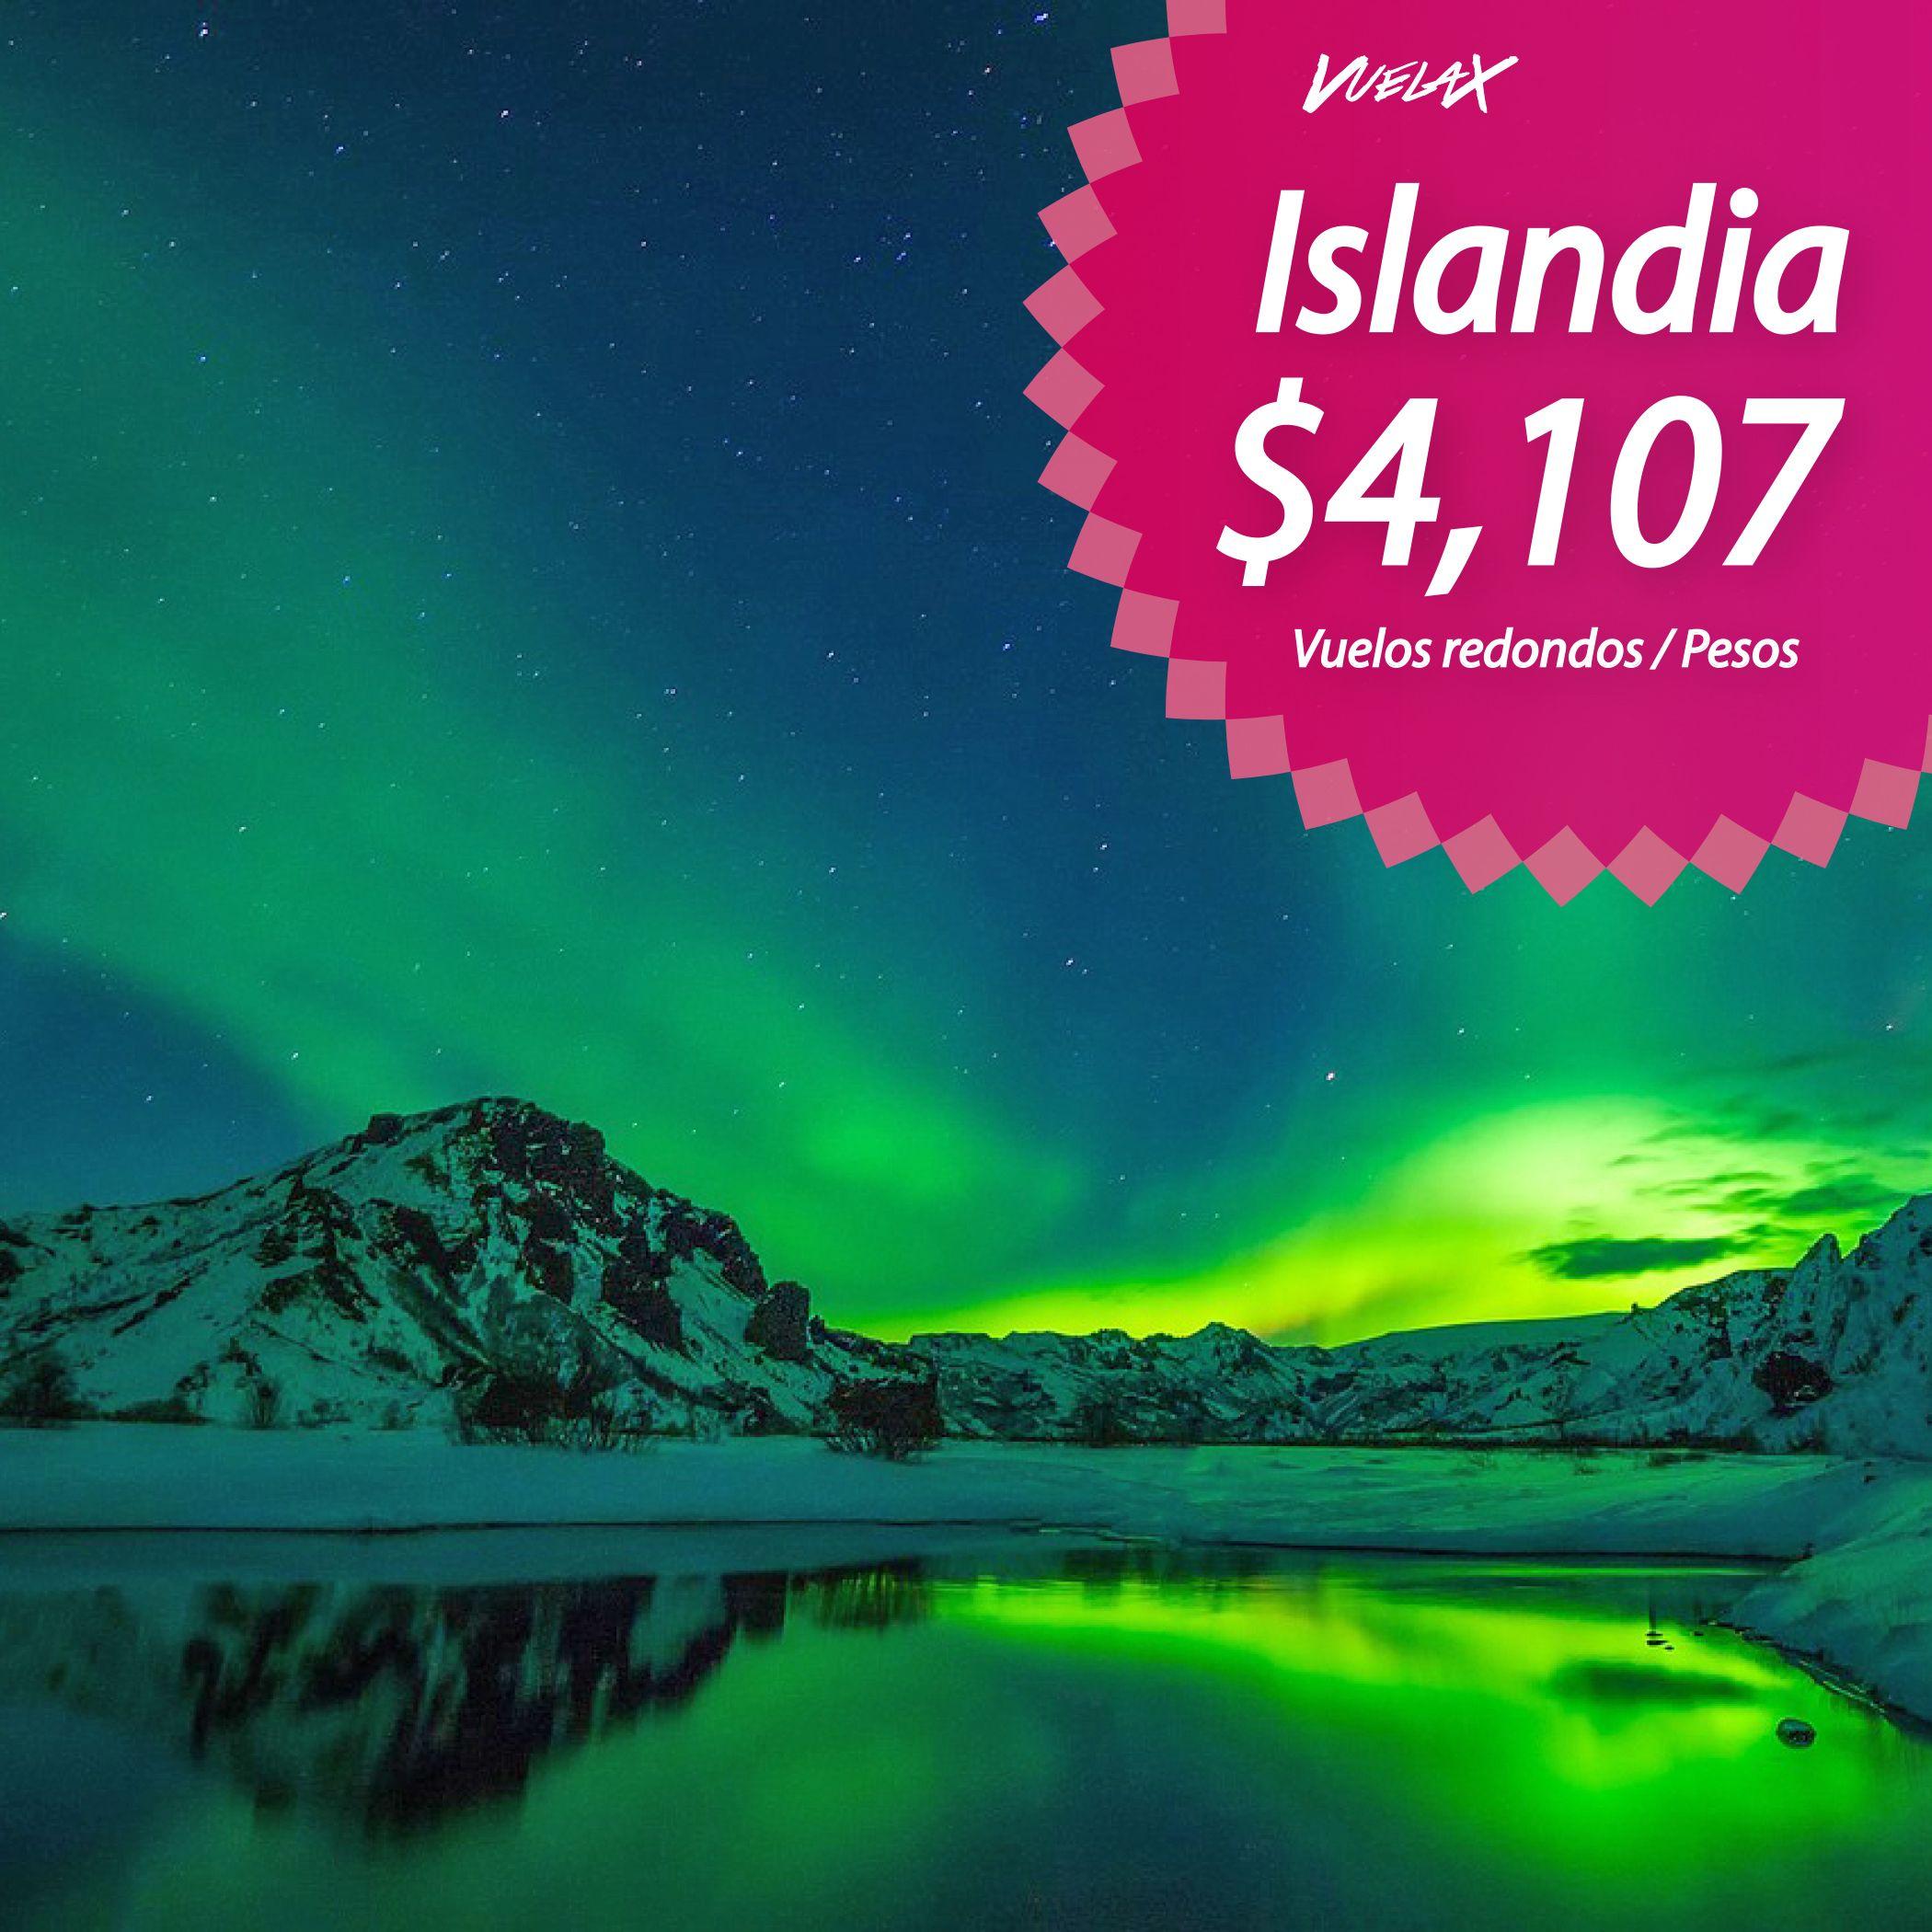 islandlax-compressor-3